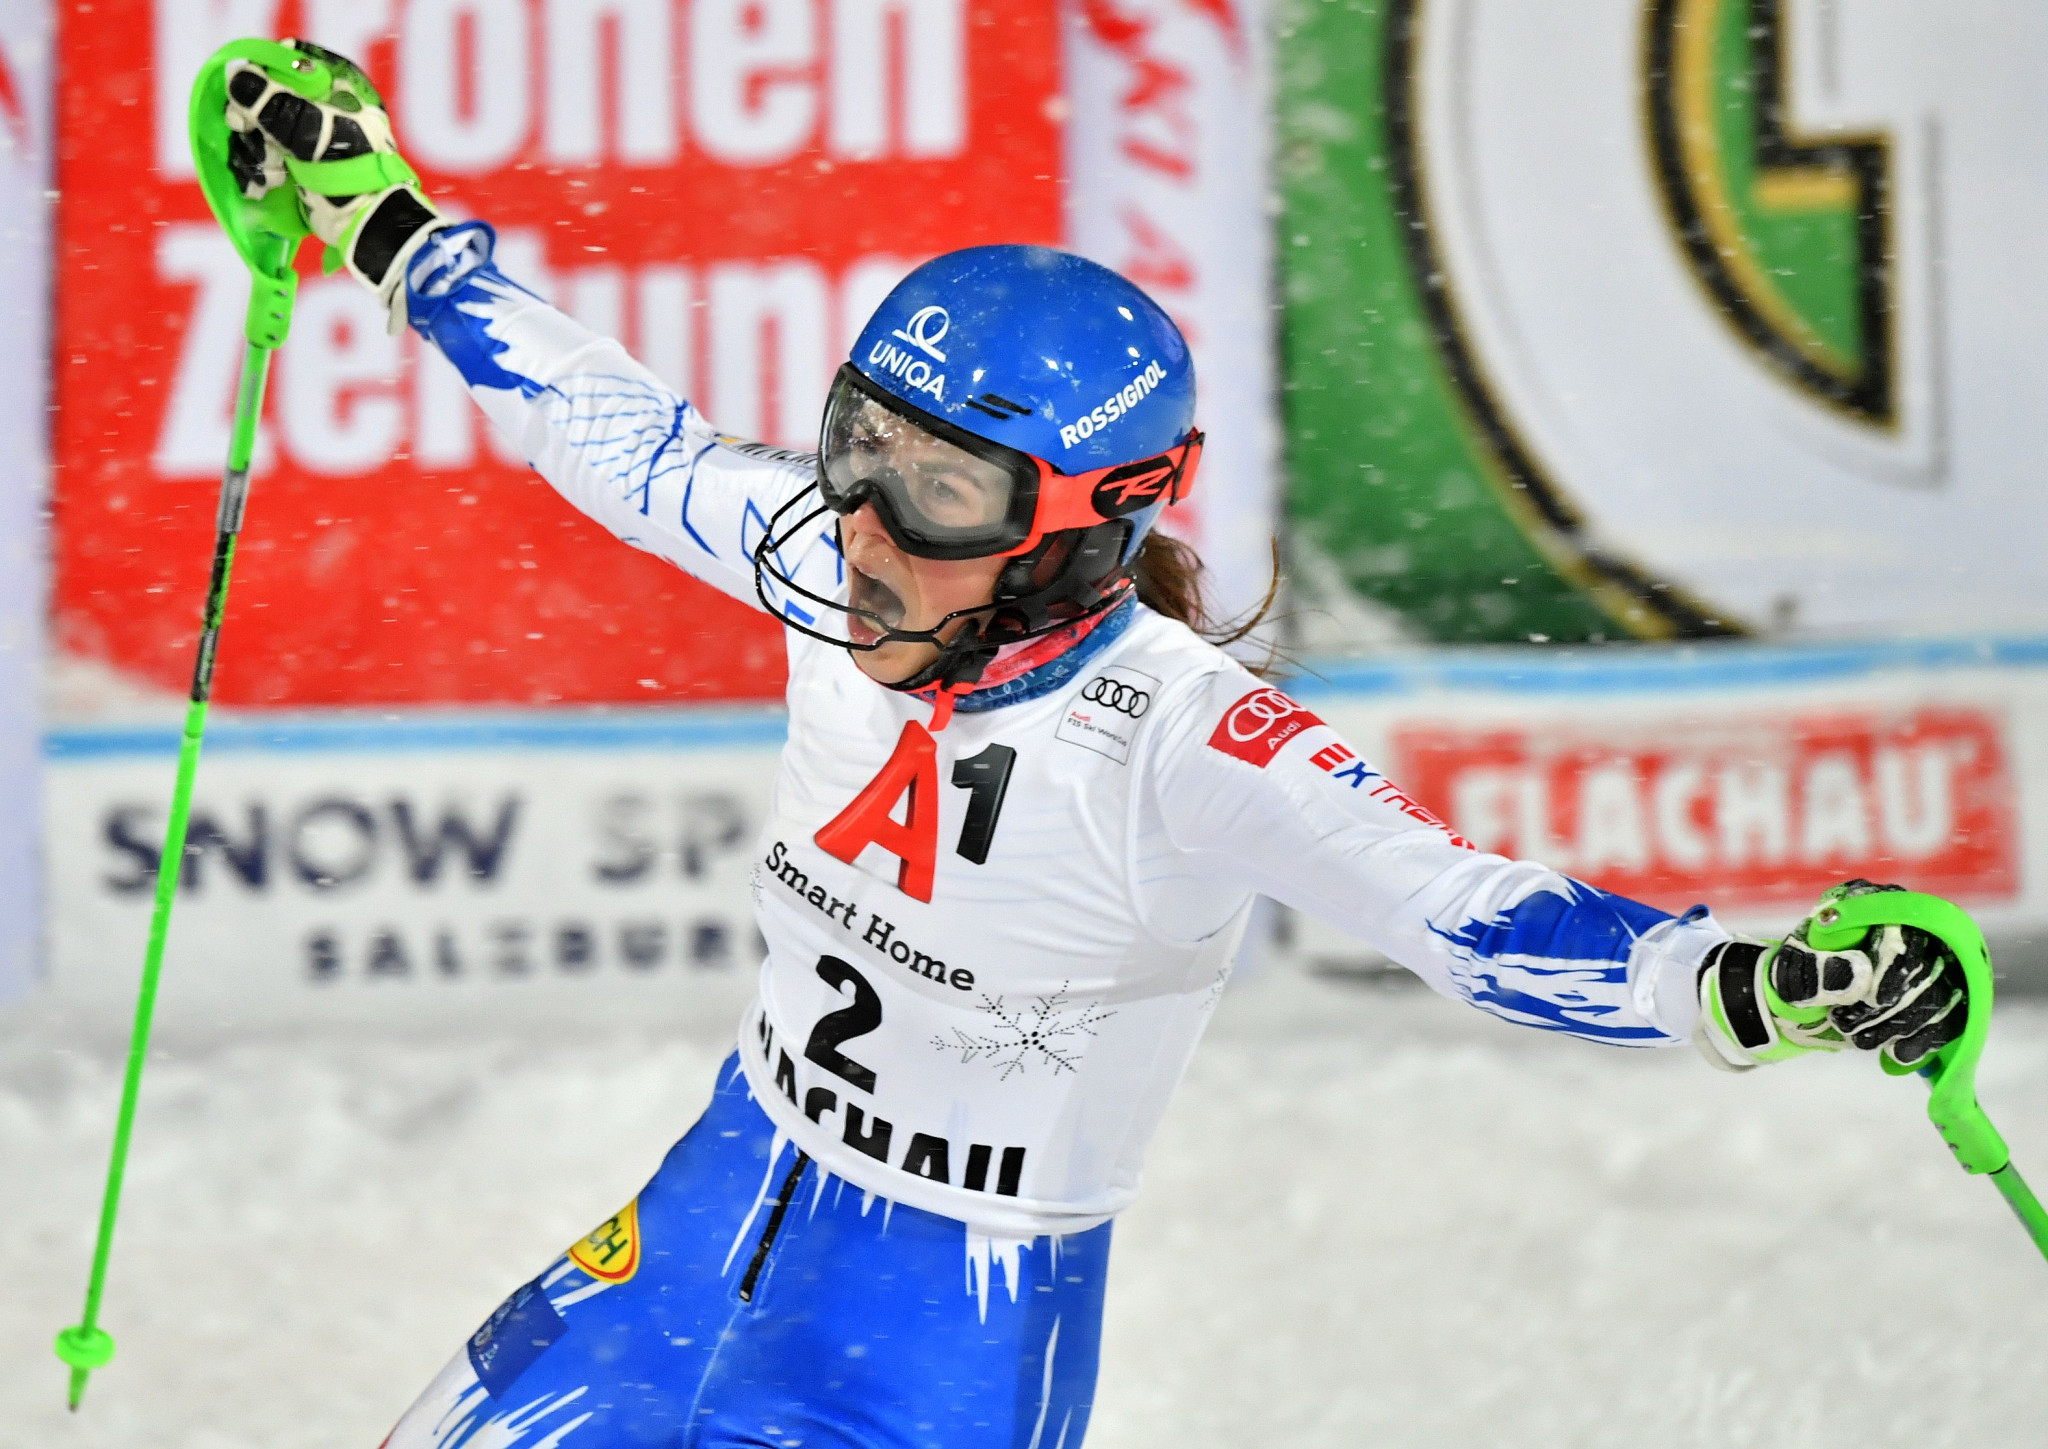 Vlhova beats Shiffrin amid blizzard conditions at Alpine Skiing World Cup in Flachau